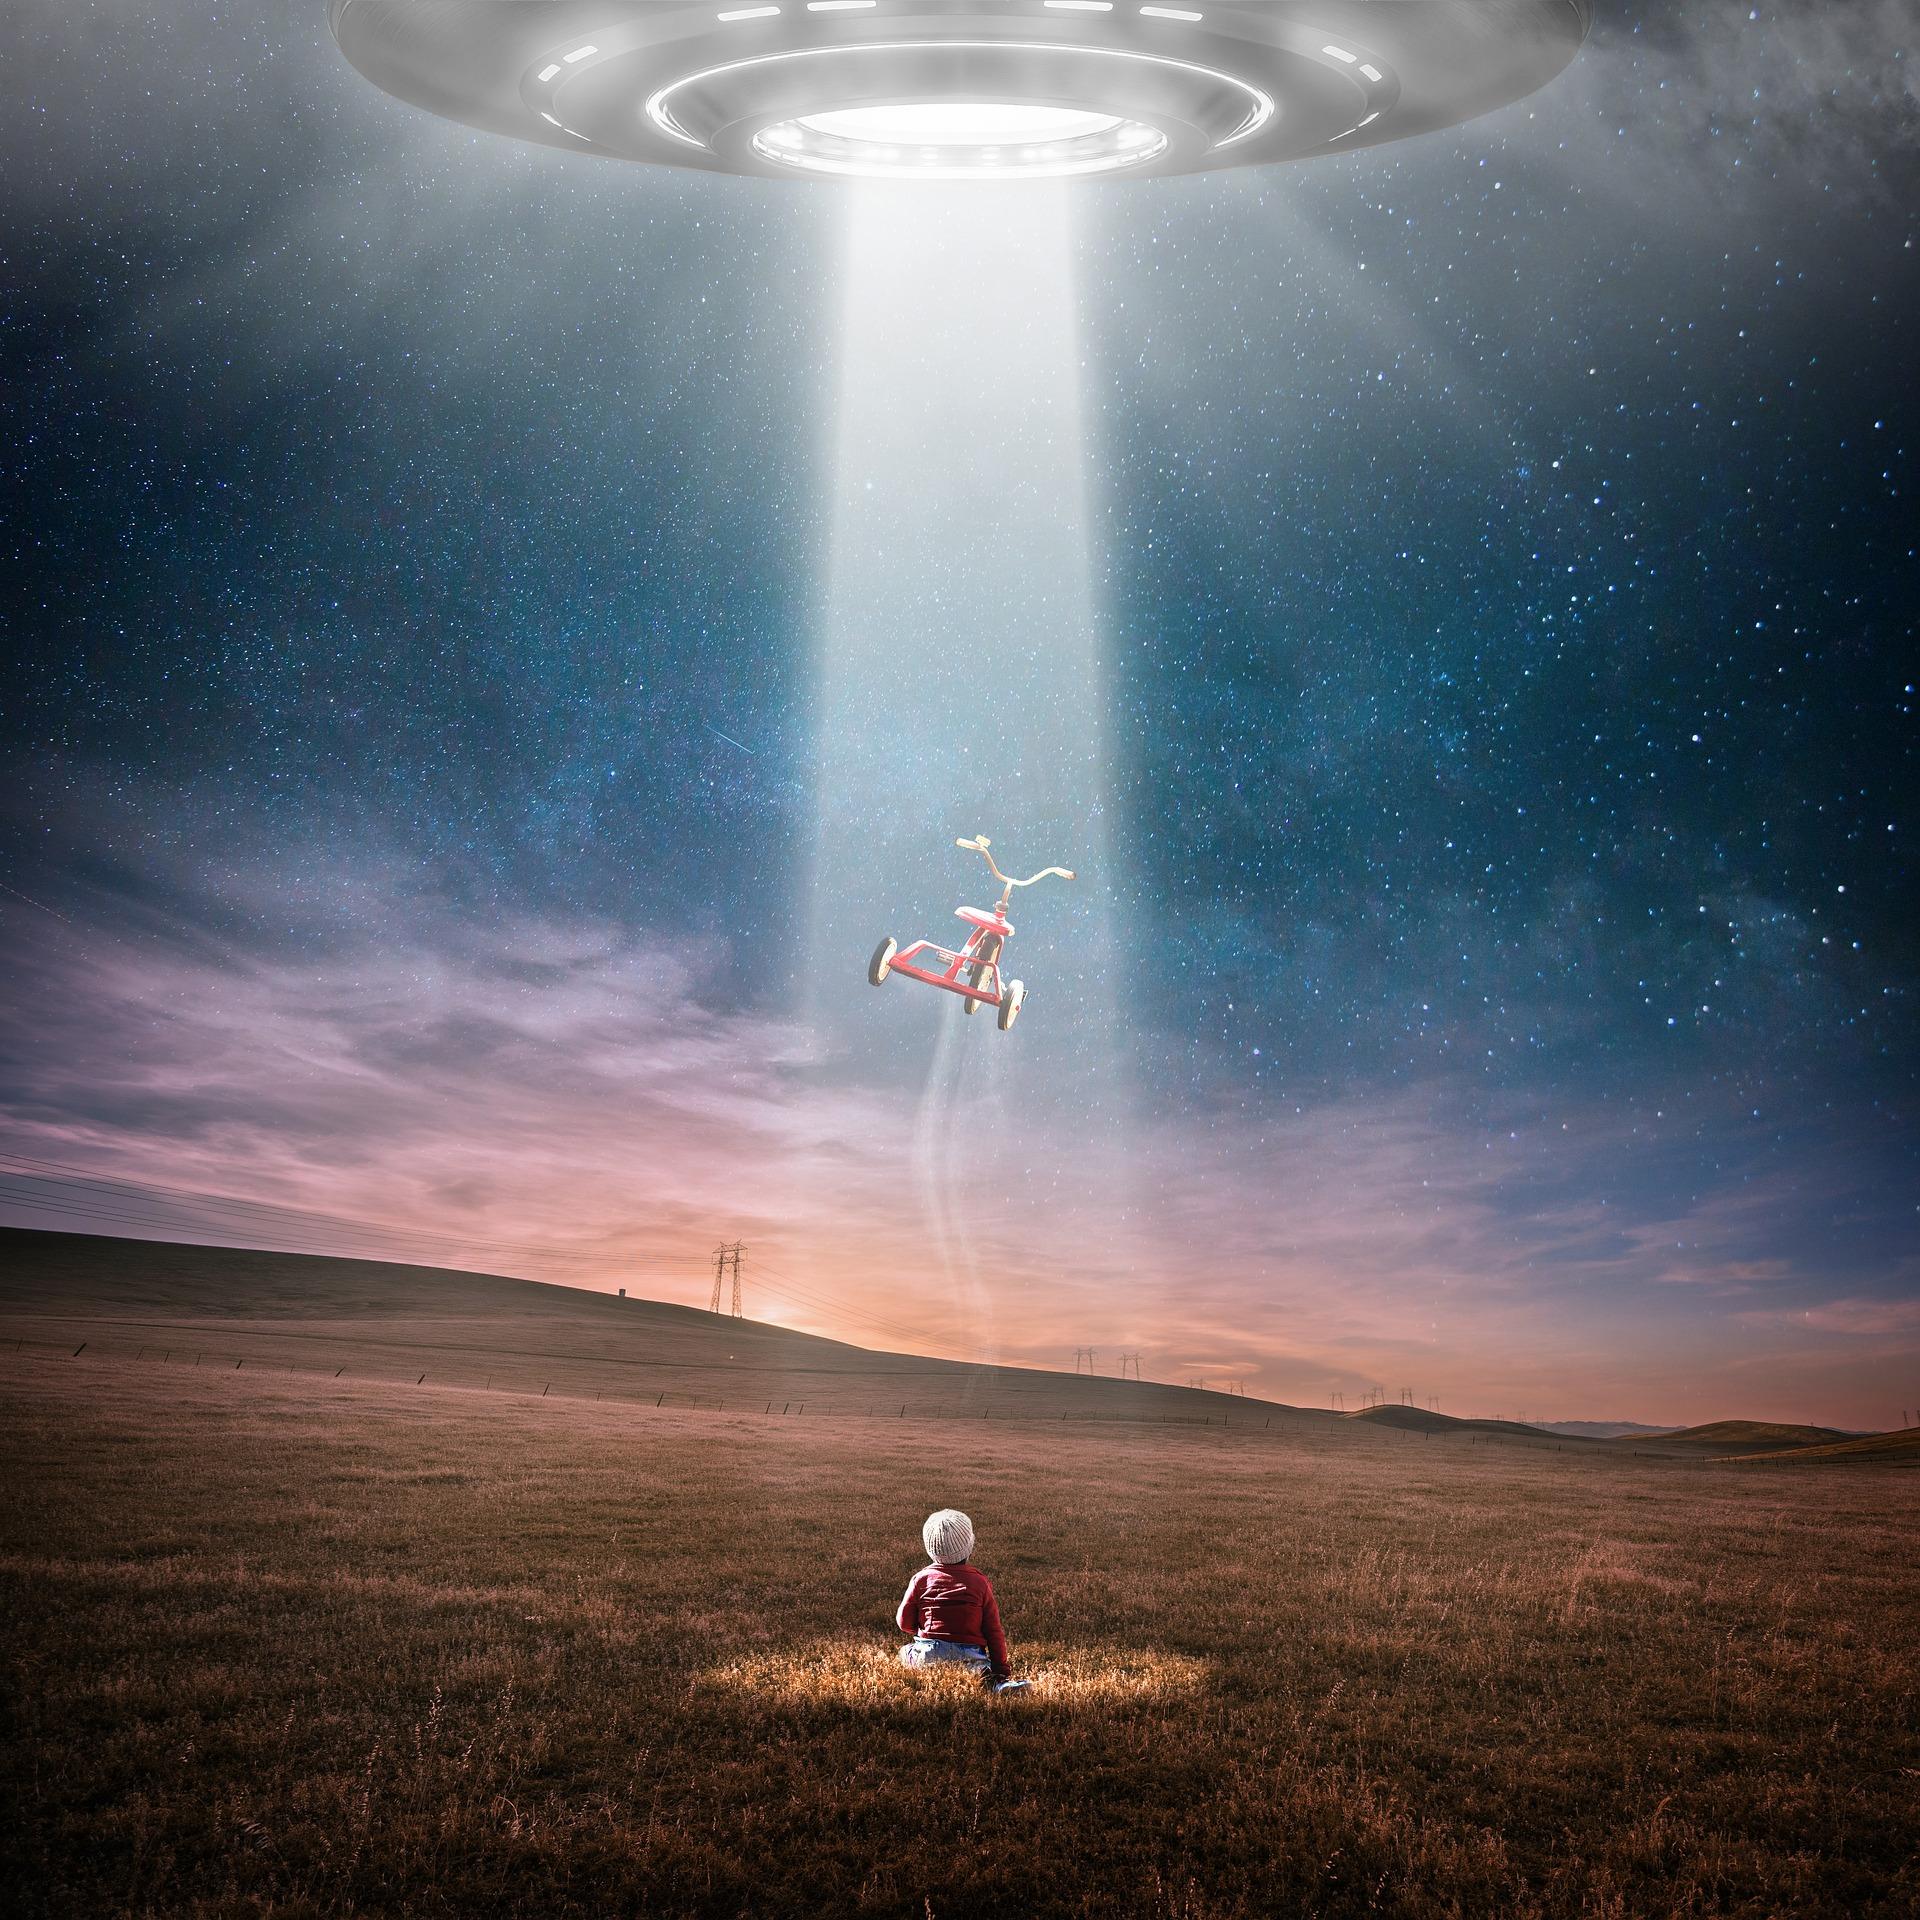 jonny-lindner-ufo